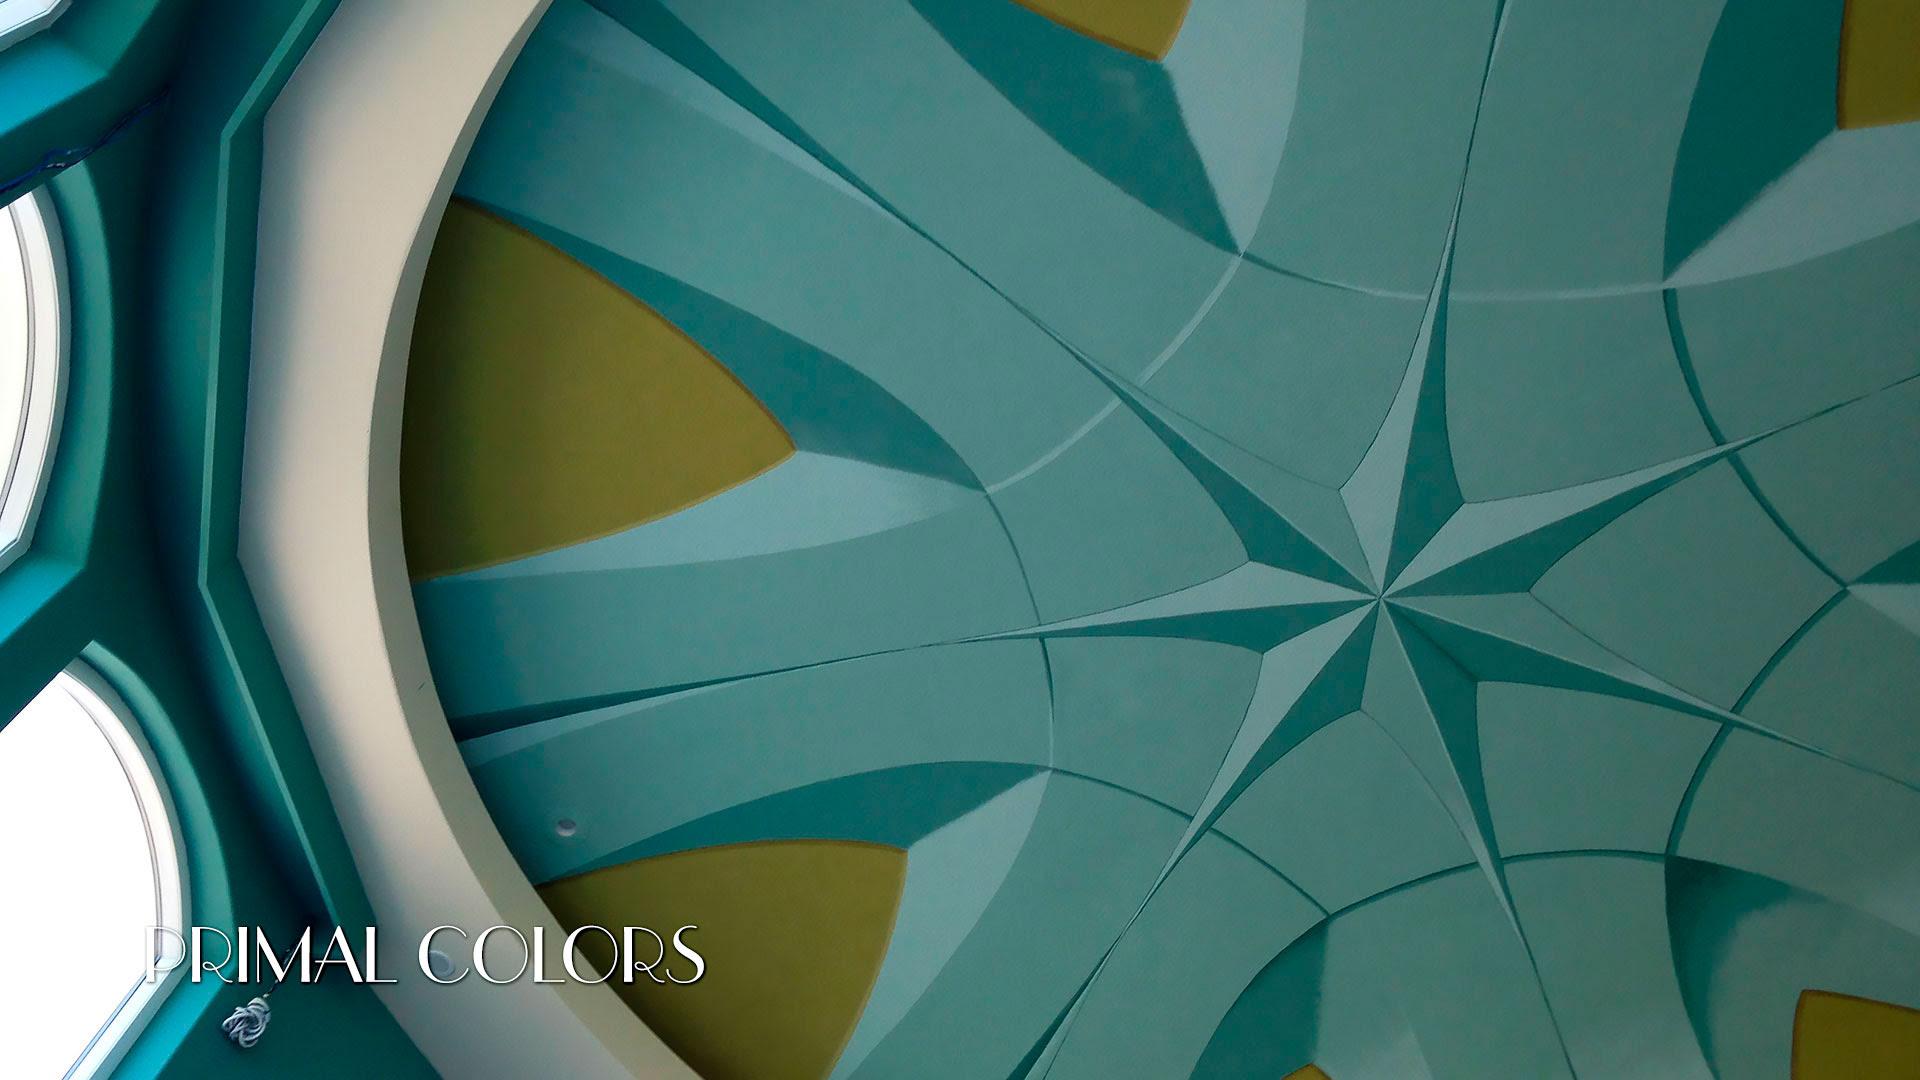 Primal Colors Decorative Painting Contractor Ormond Beach Florida